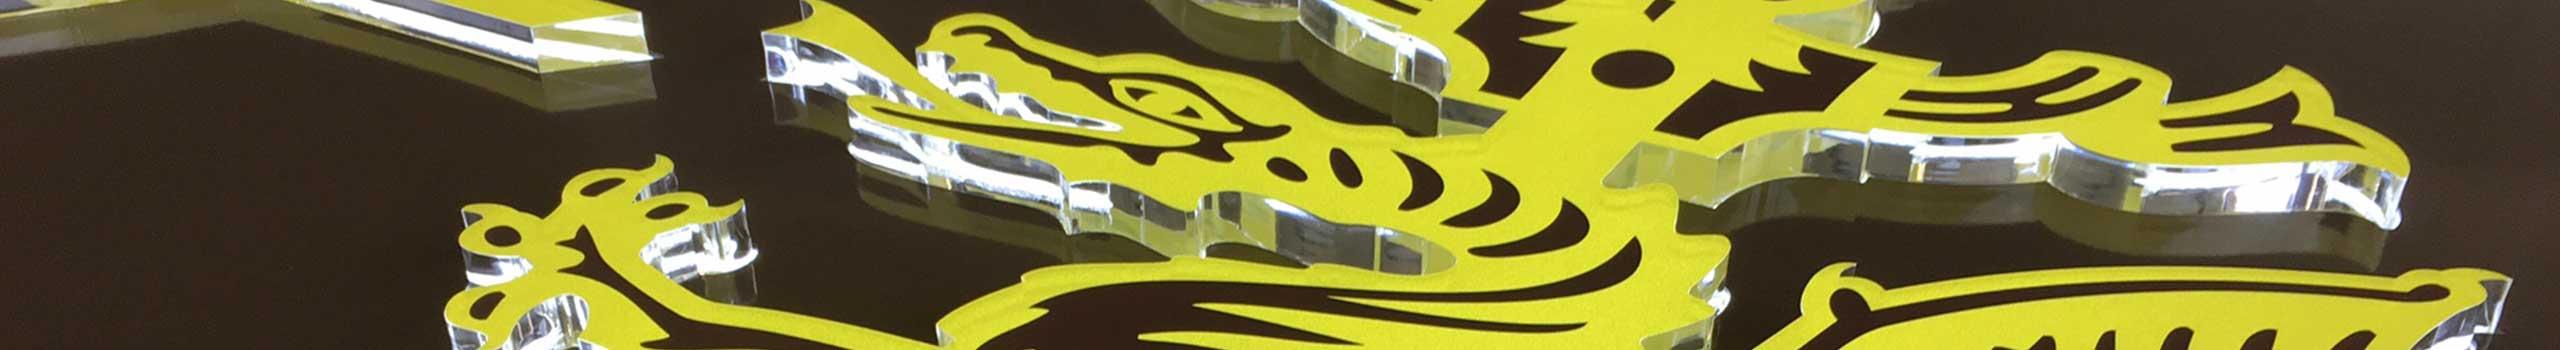 slider-produkte-transparente-01